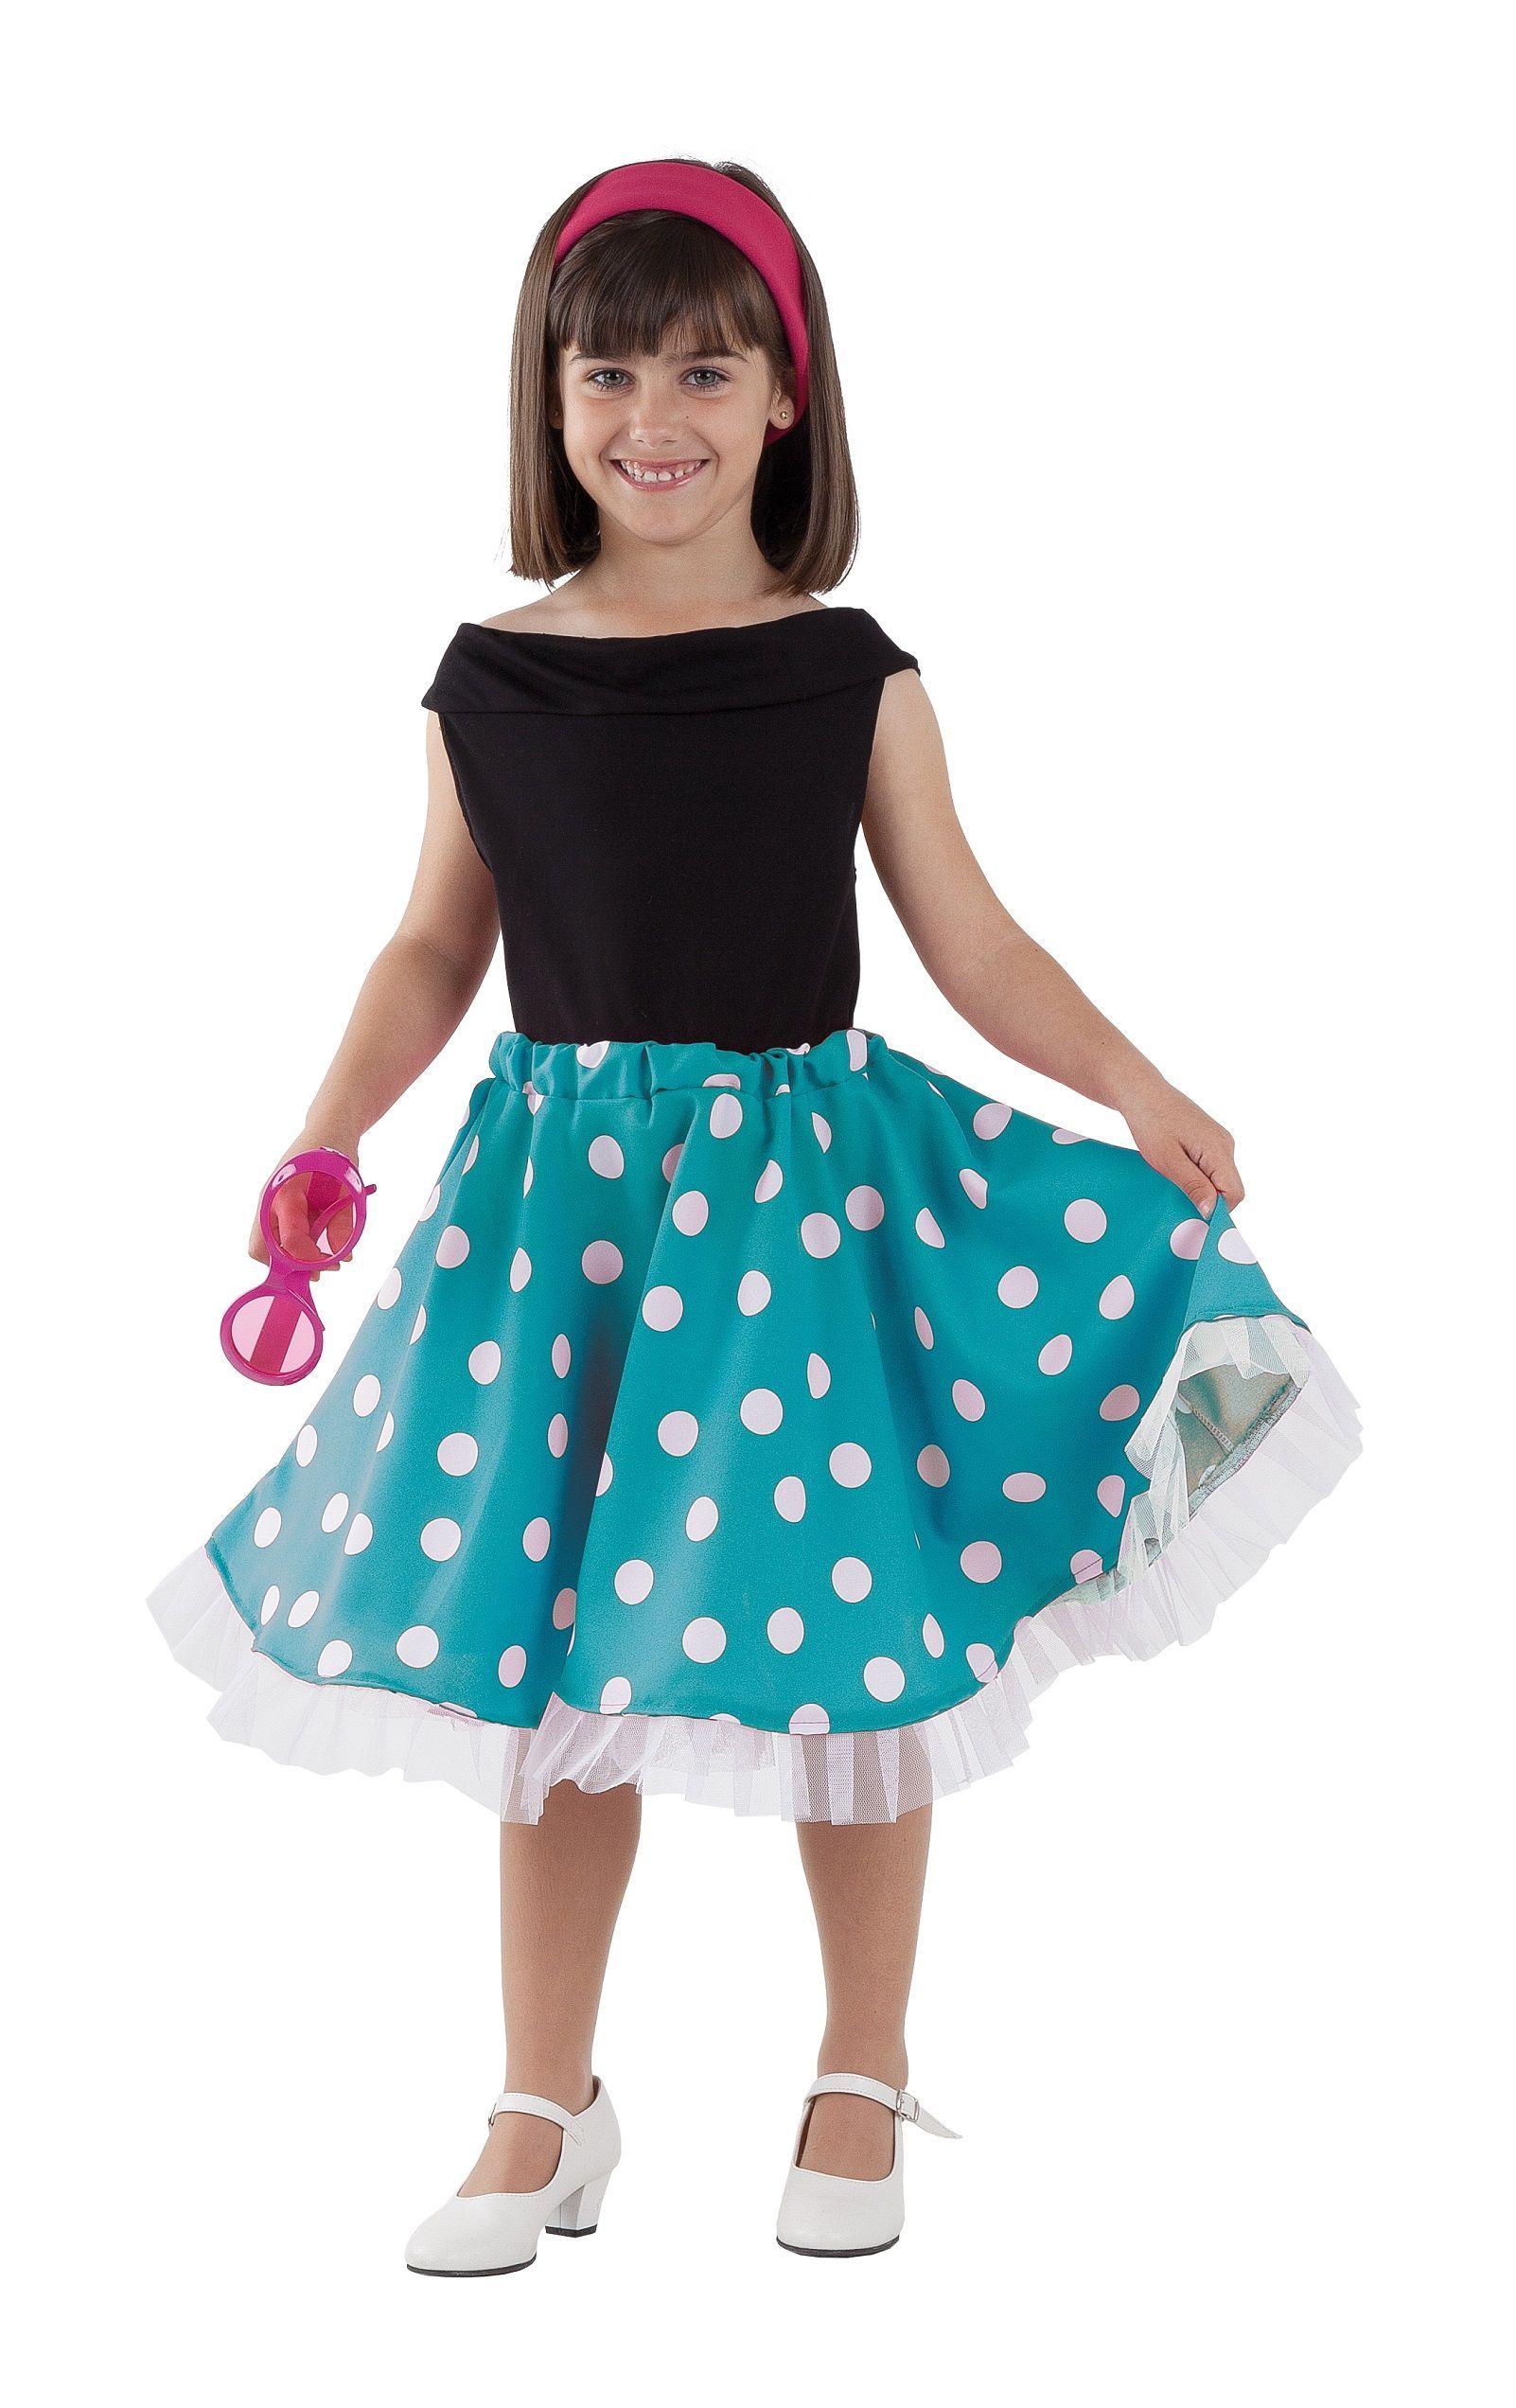 Vestido de lunares azul inspirado años 50 para niña 1aa05d45658b